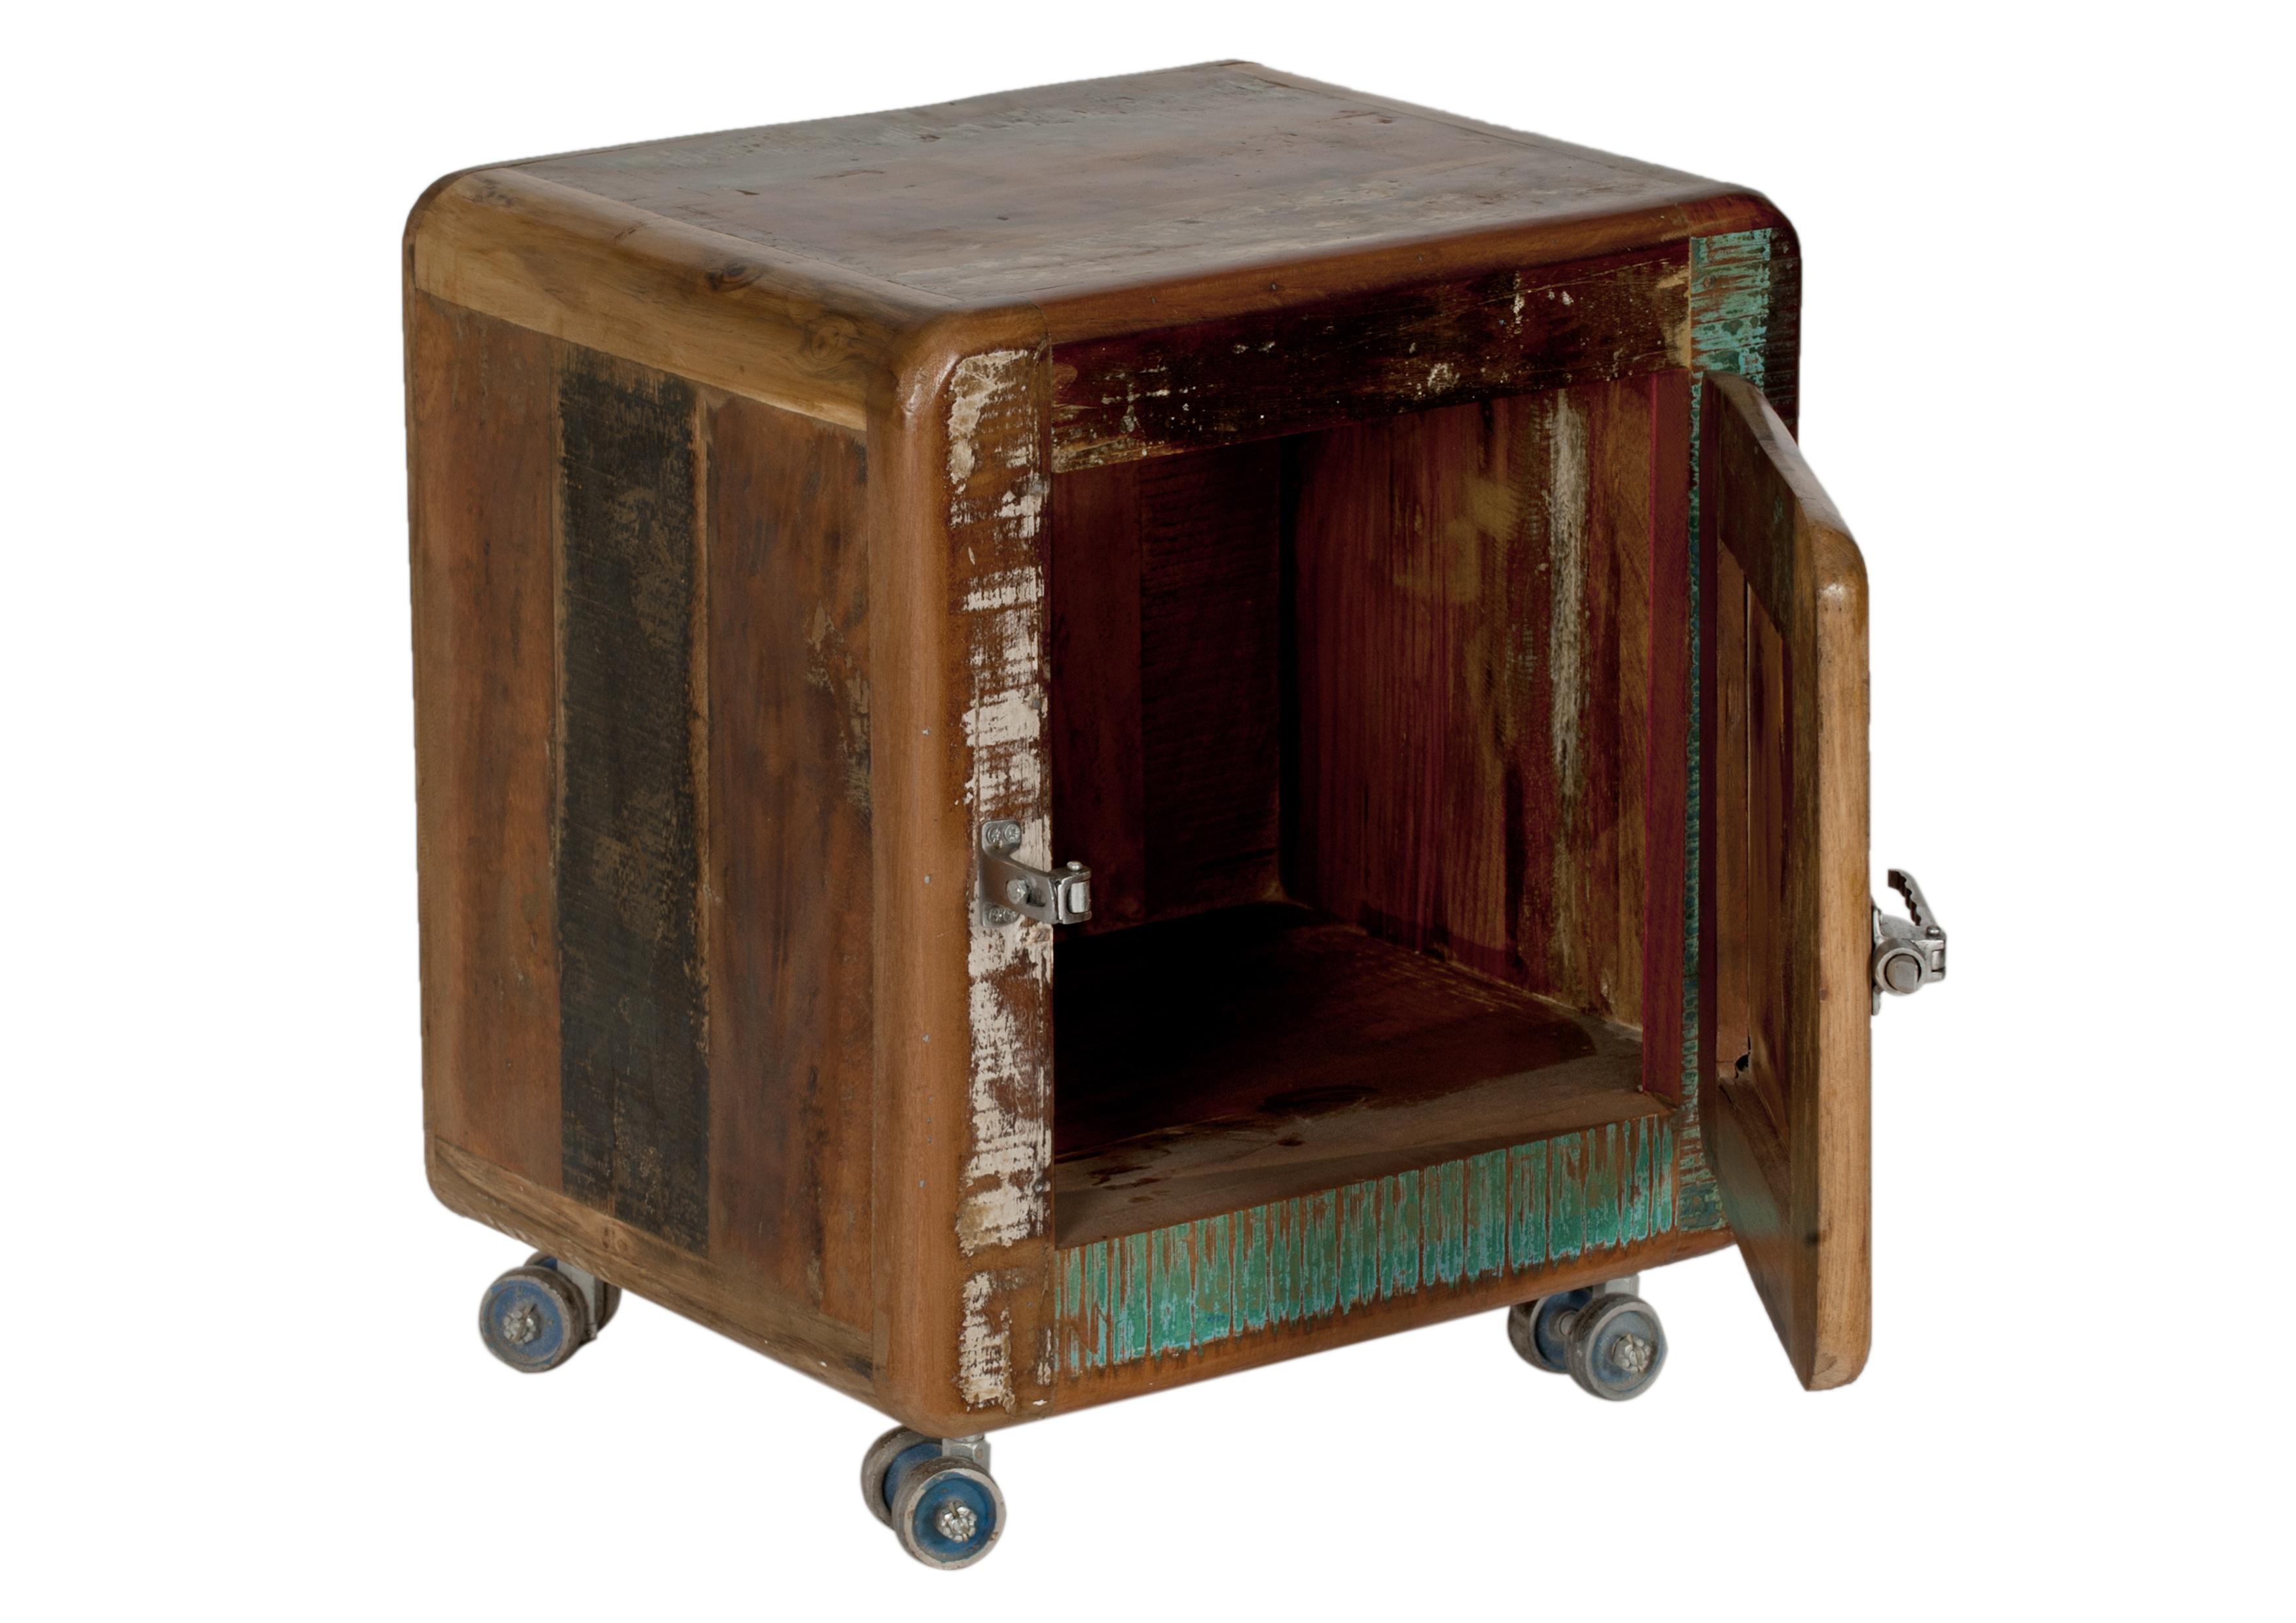 Sit Nachttisch Fridge aus recyceltem Altholz